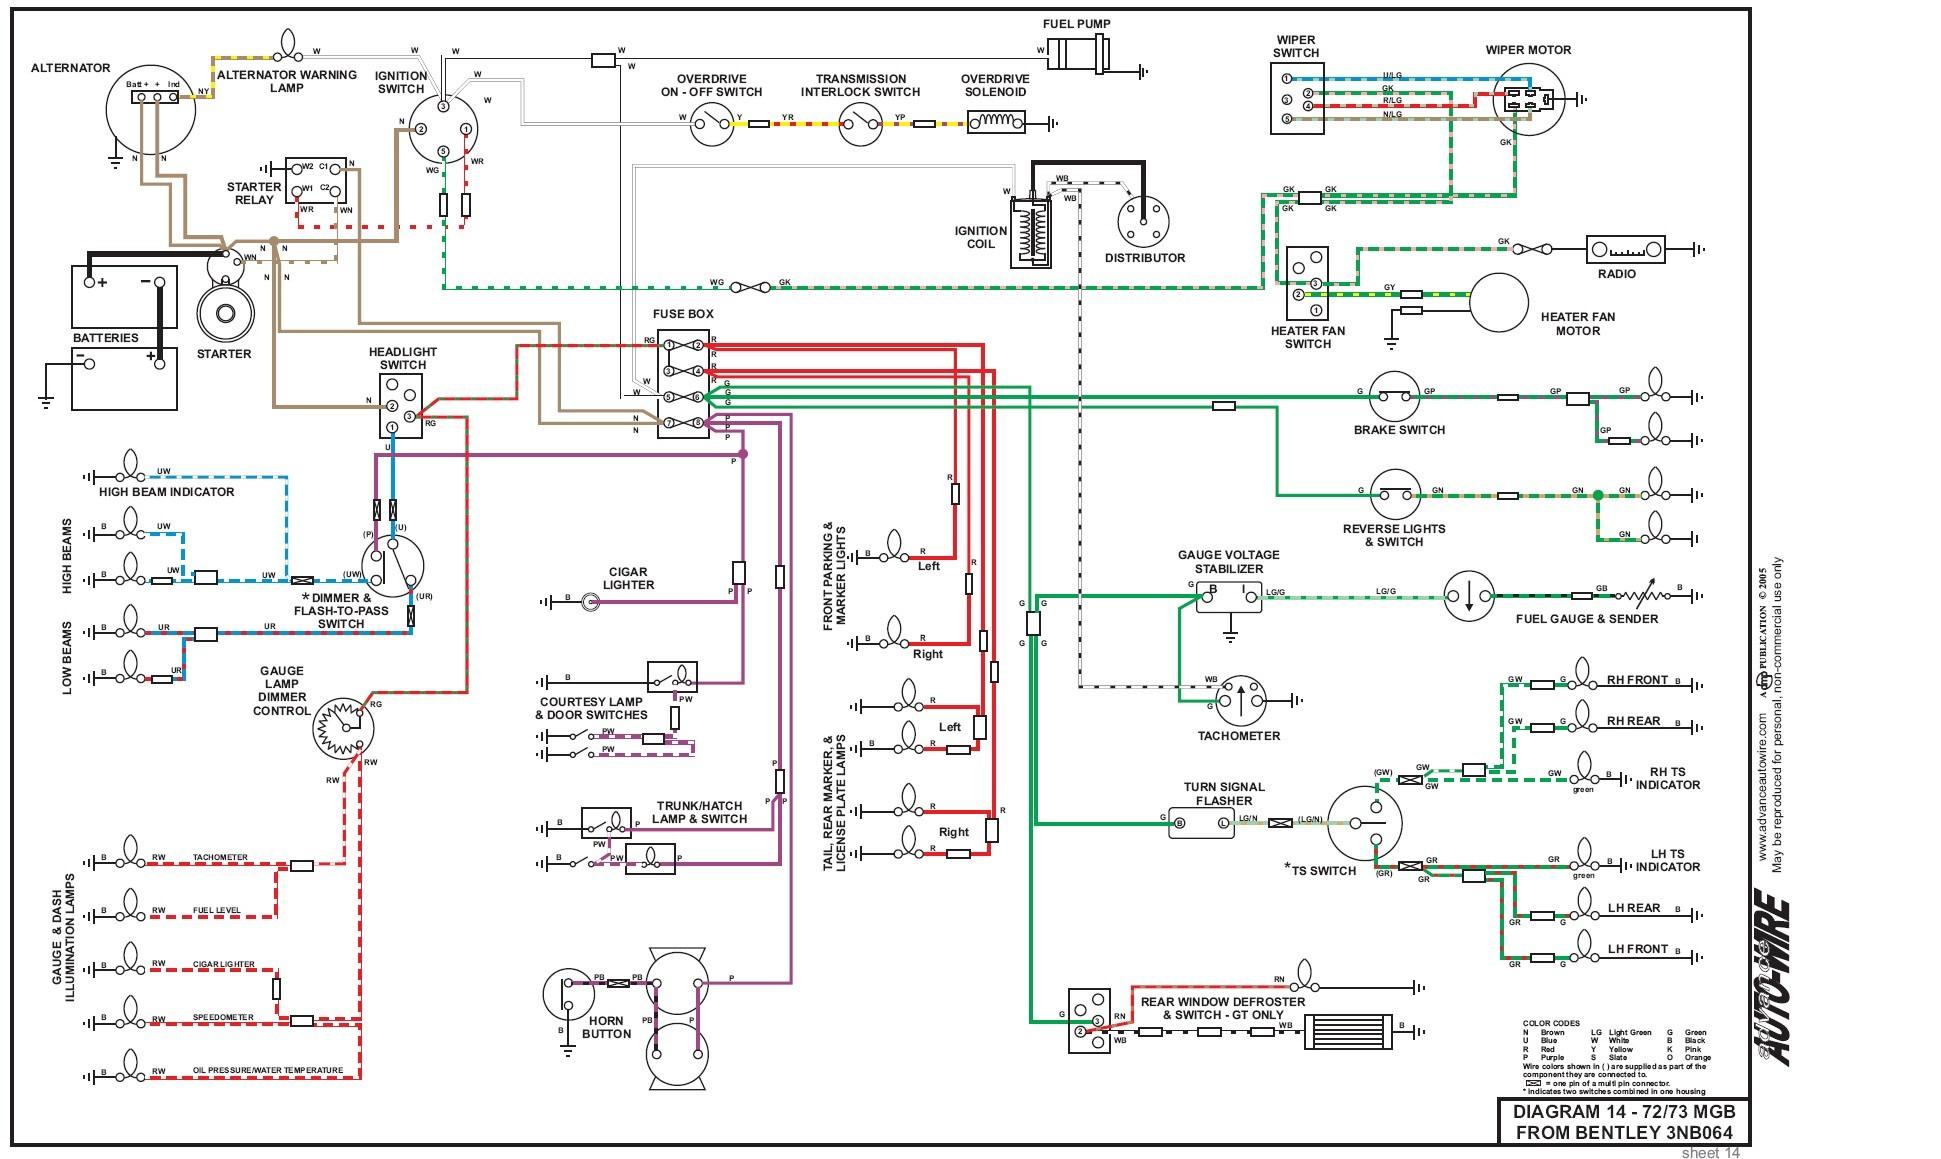 Powerstat Wiring Diagram - Trusted Wiring Diagram Online on distribution transformer wiring diagram, rectifier wiring diagram, delta-wye transformer wiring diagram, control wiring diagram, voltage wiring diagram, ammeter wiring diagram, armature wiring diagram, isolation transformer wiring diagram, capacitor wiring diagram, inverter wiring diagram, potential transformer wiring diagram, resistor wiring diagram, current transformer wiring diagram, alternator wiring diagram, step up transformer wiring diagram, flyback transformer wiring diagram, tesla coil wiring diagram, circuit wiring diagram, electricity wiring diagram, power transformer wiring diagram,